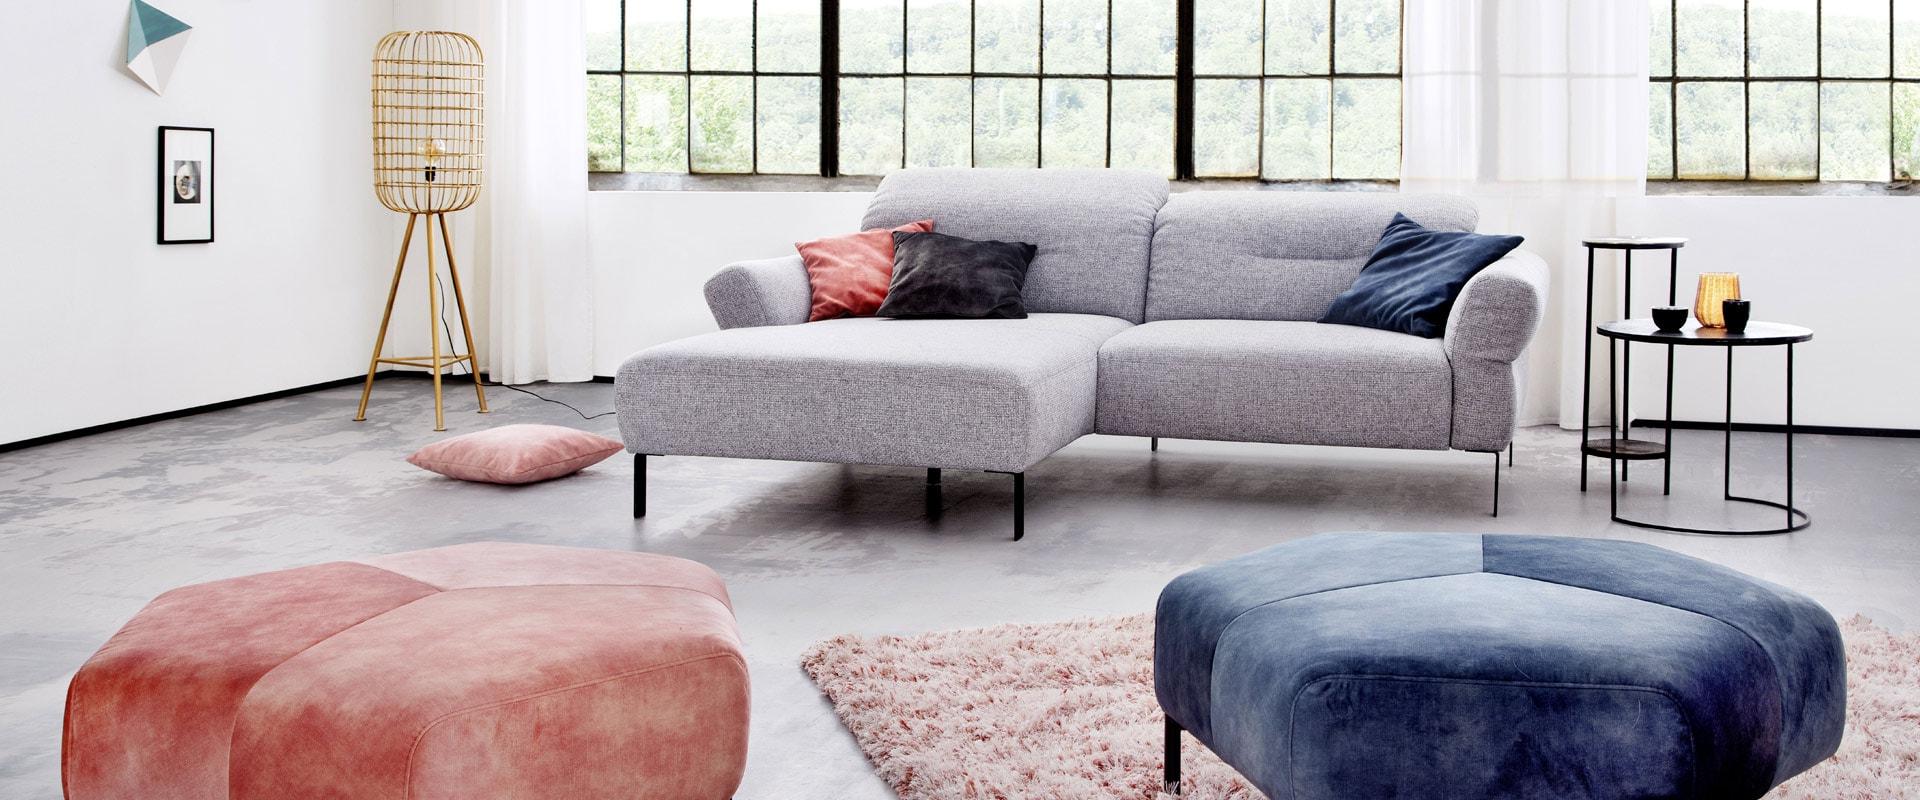 Fashionable Polstermöbel Von Comfort Republic – Berkemeier Home Company Inside Clemens Patio Sofas (View 12 of 25)